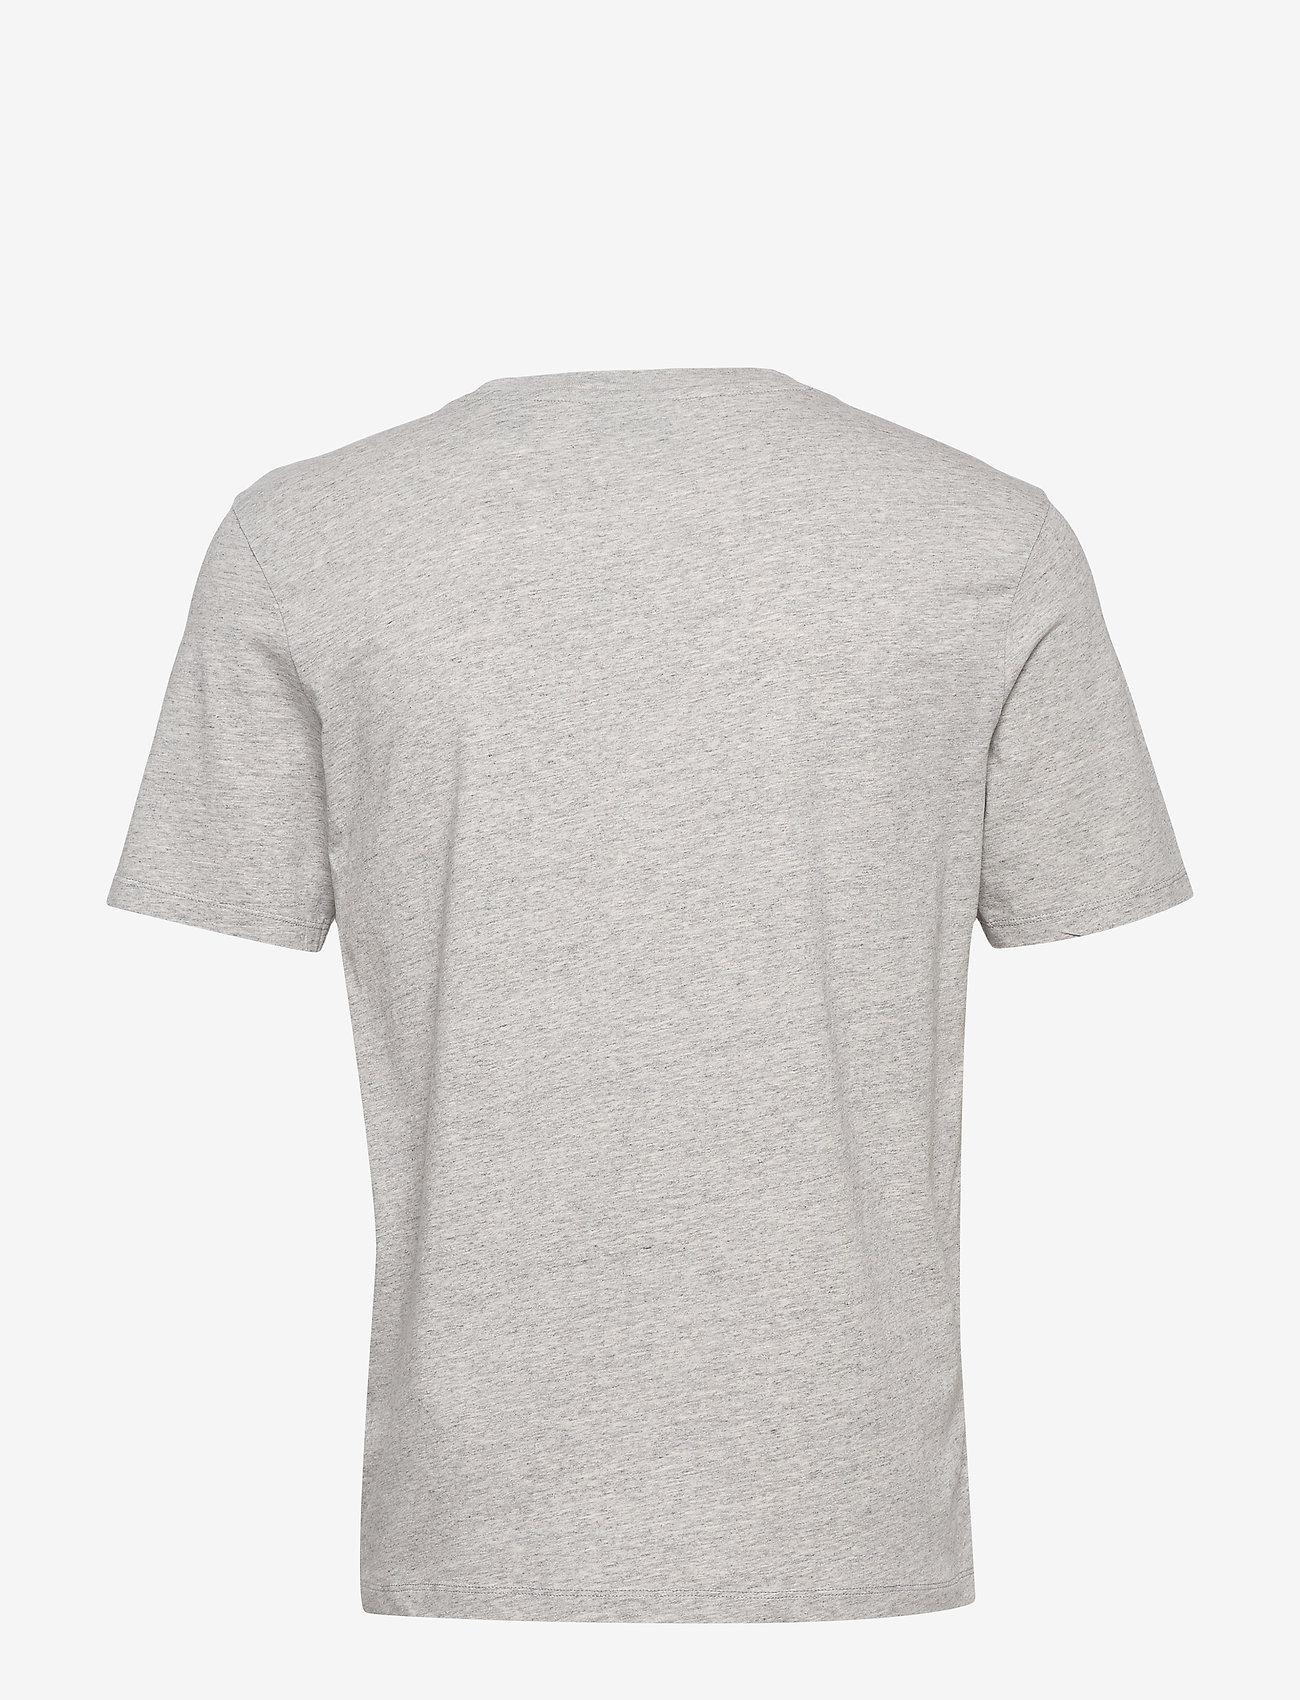 Scotch & Soda - Scotch & Soda crew neck logo tee - short-sleeved t-shirts - grey melange - 1